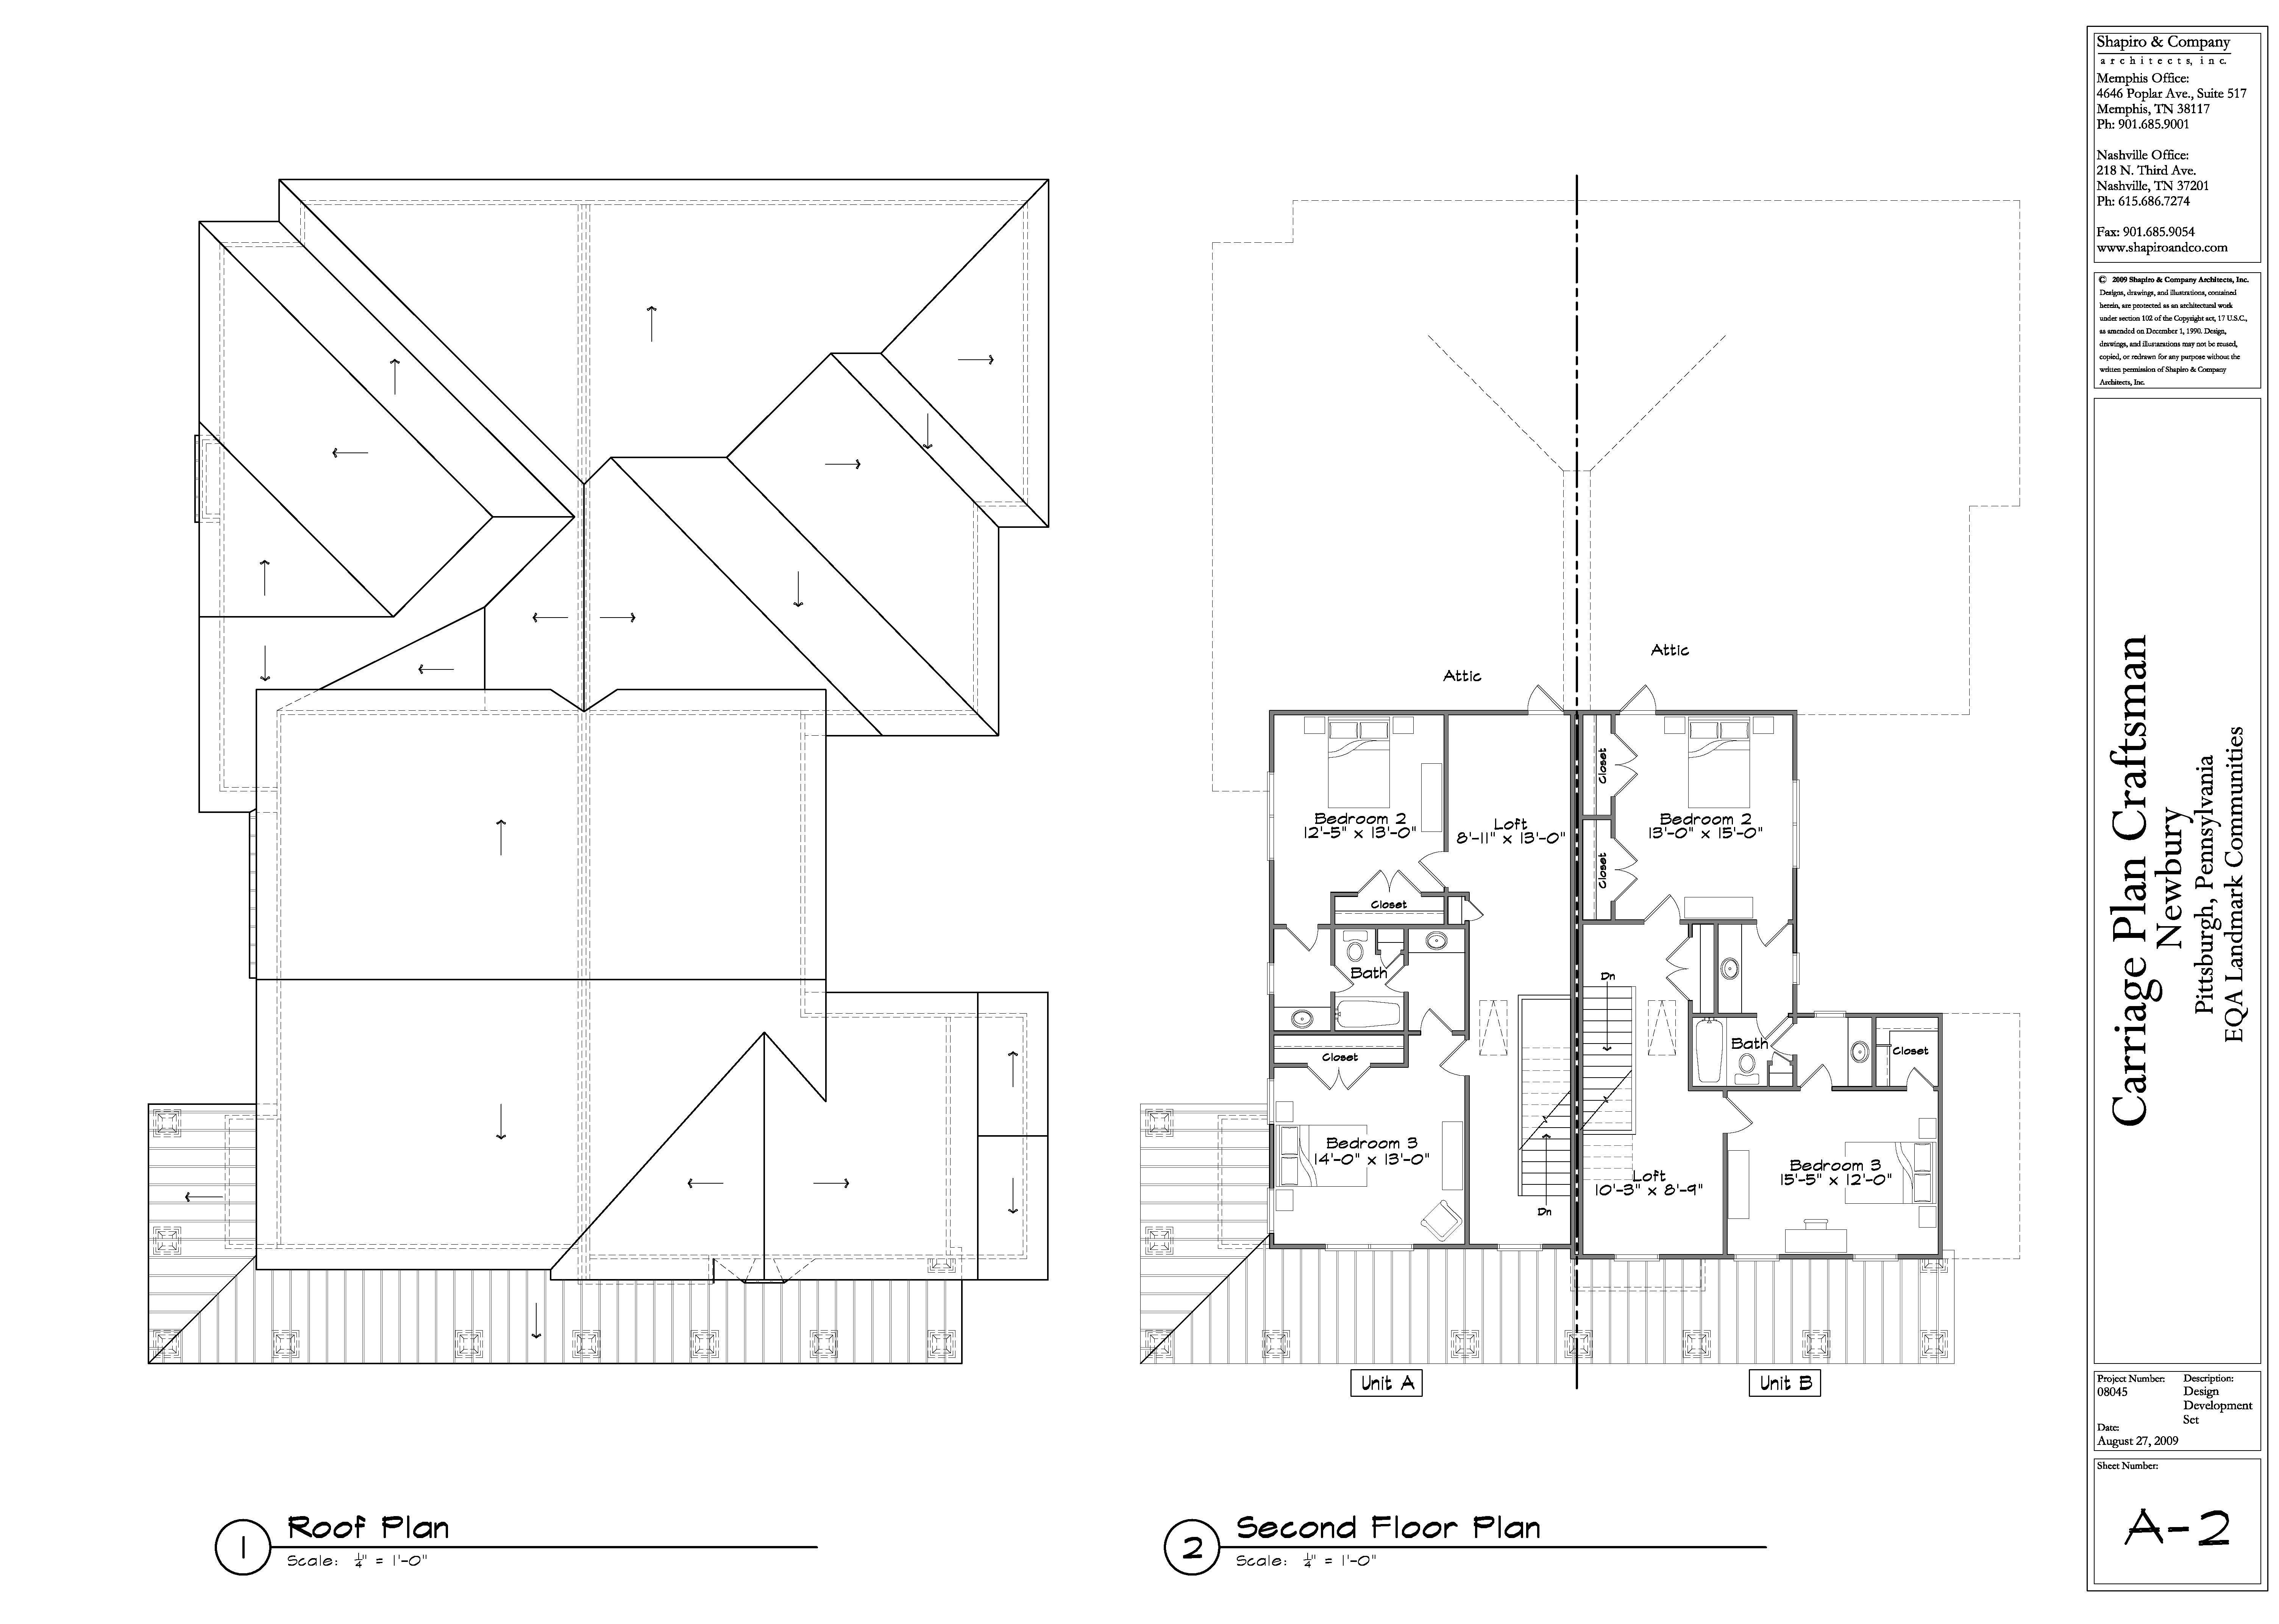 6018x4289 Roof Plan